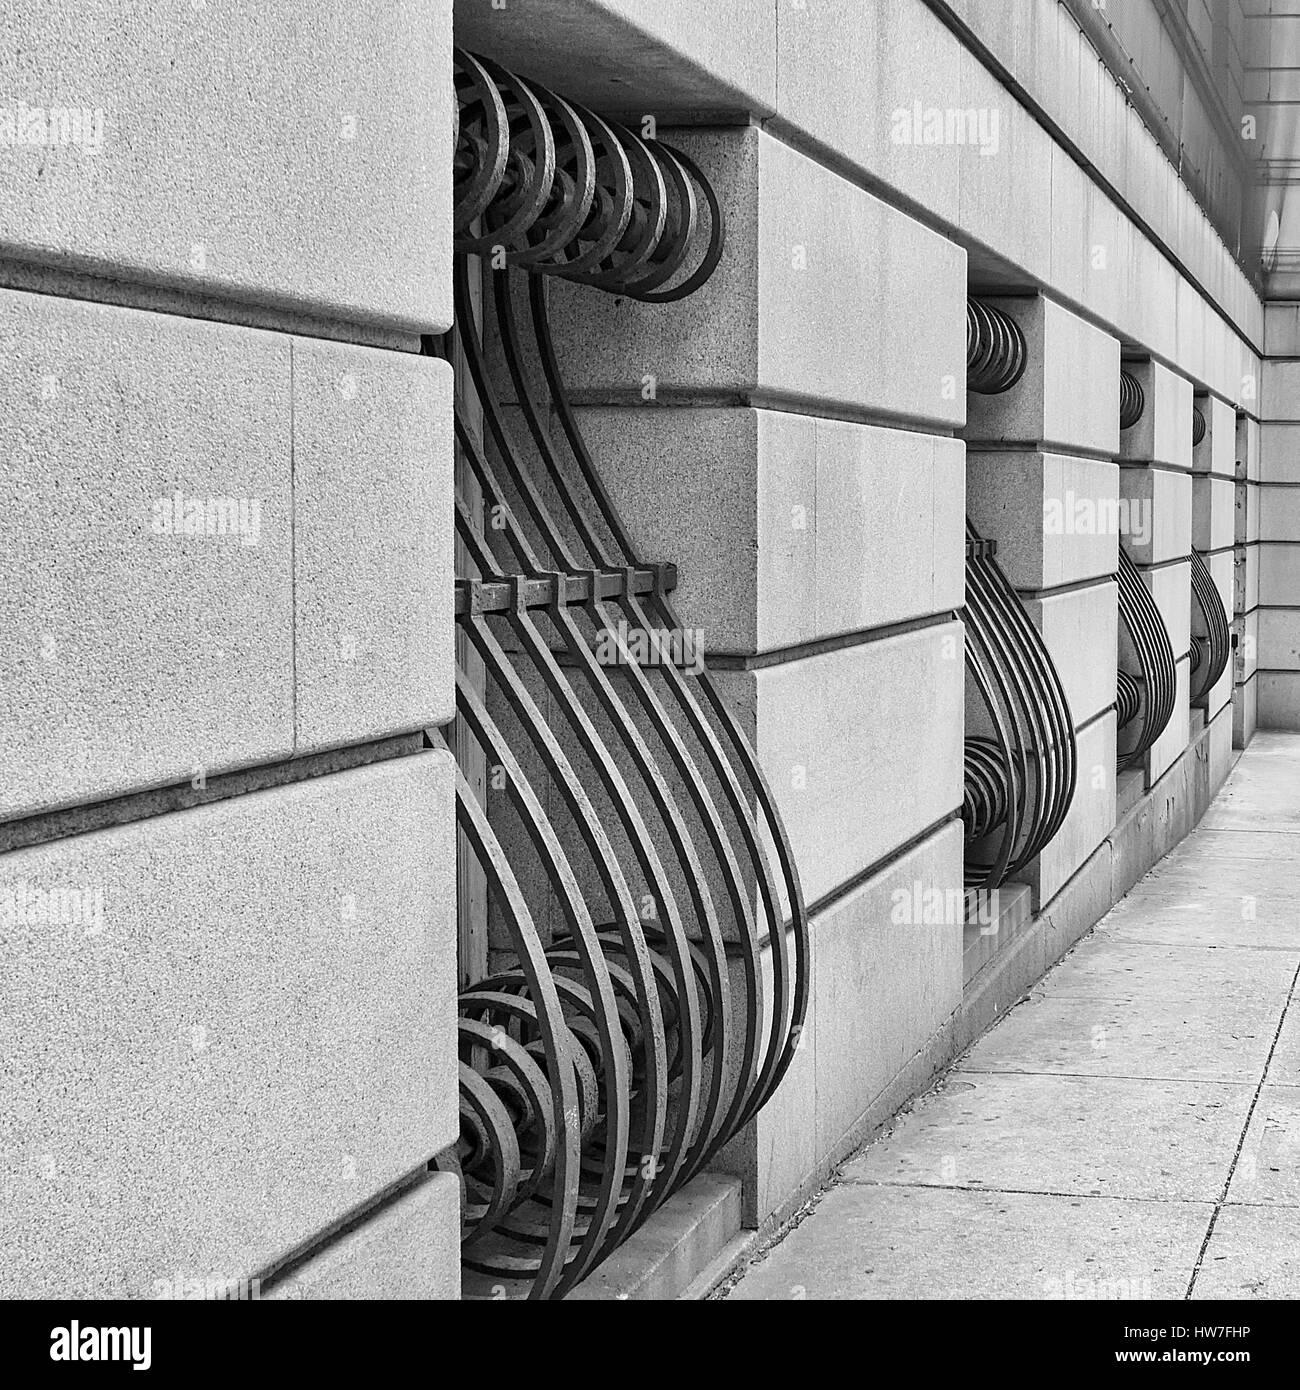 Ornate window bars on building - Stock Image